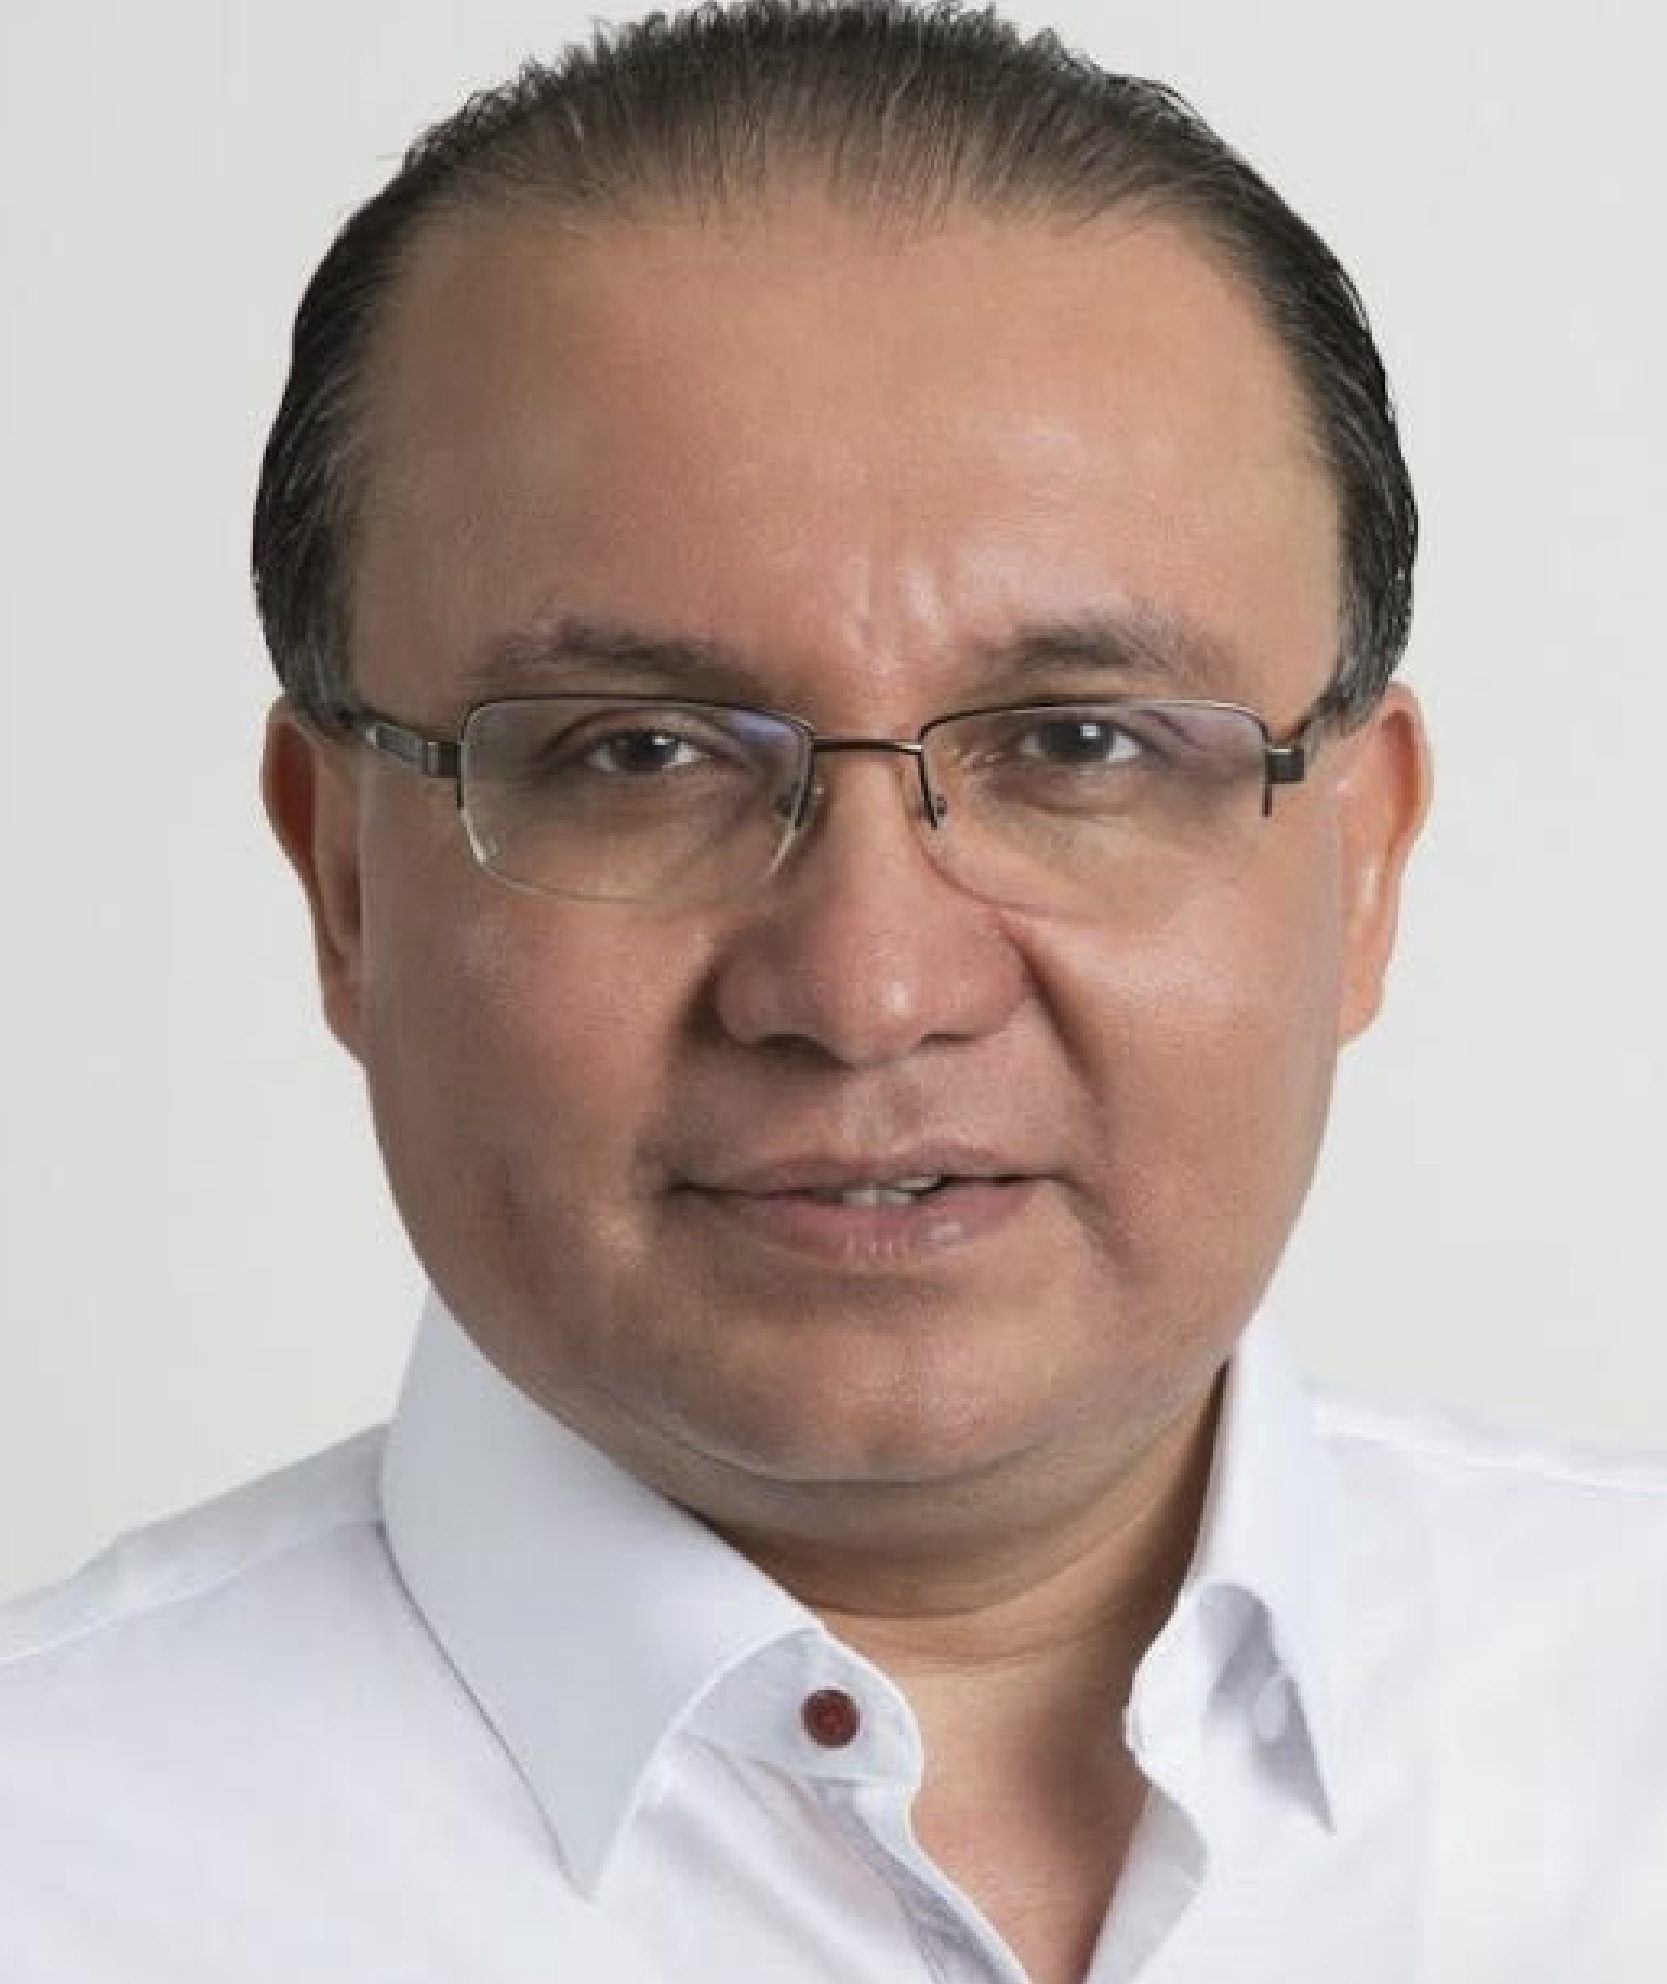 Sergio Jacobo Gutiérrez